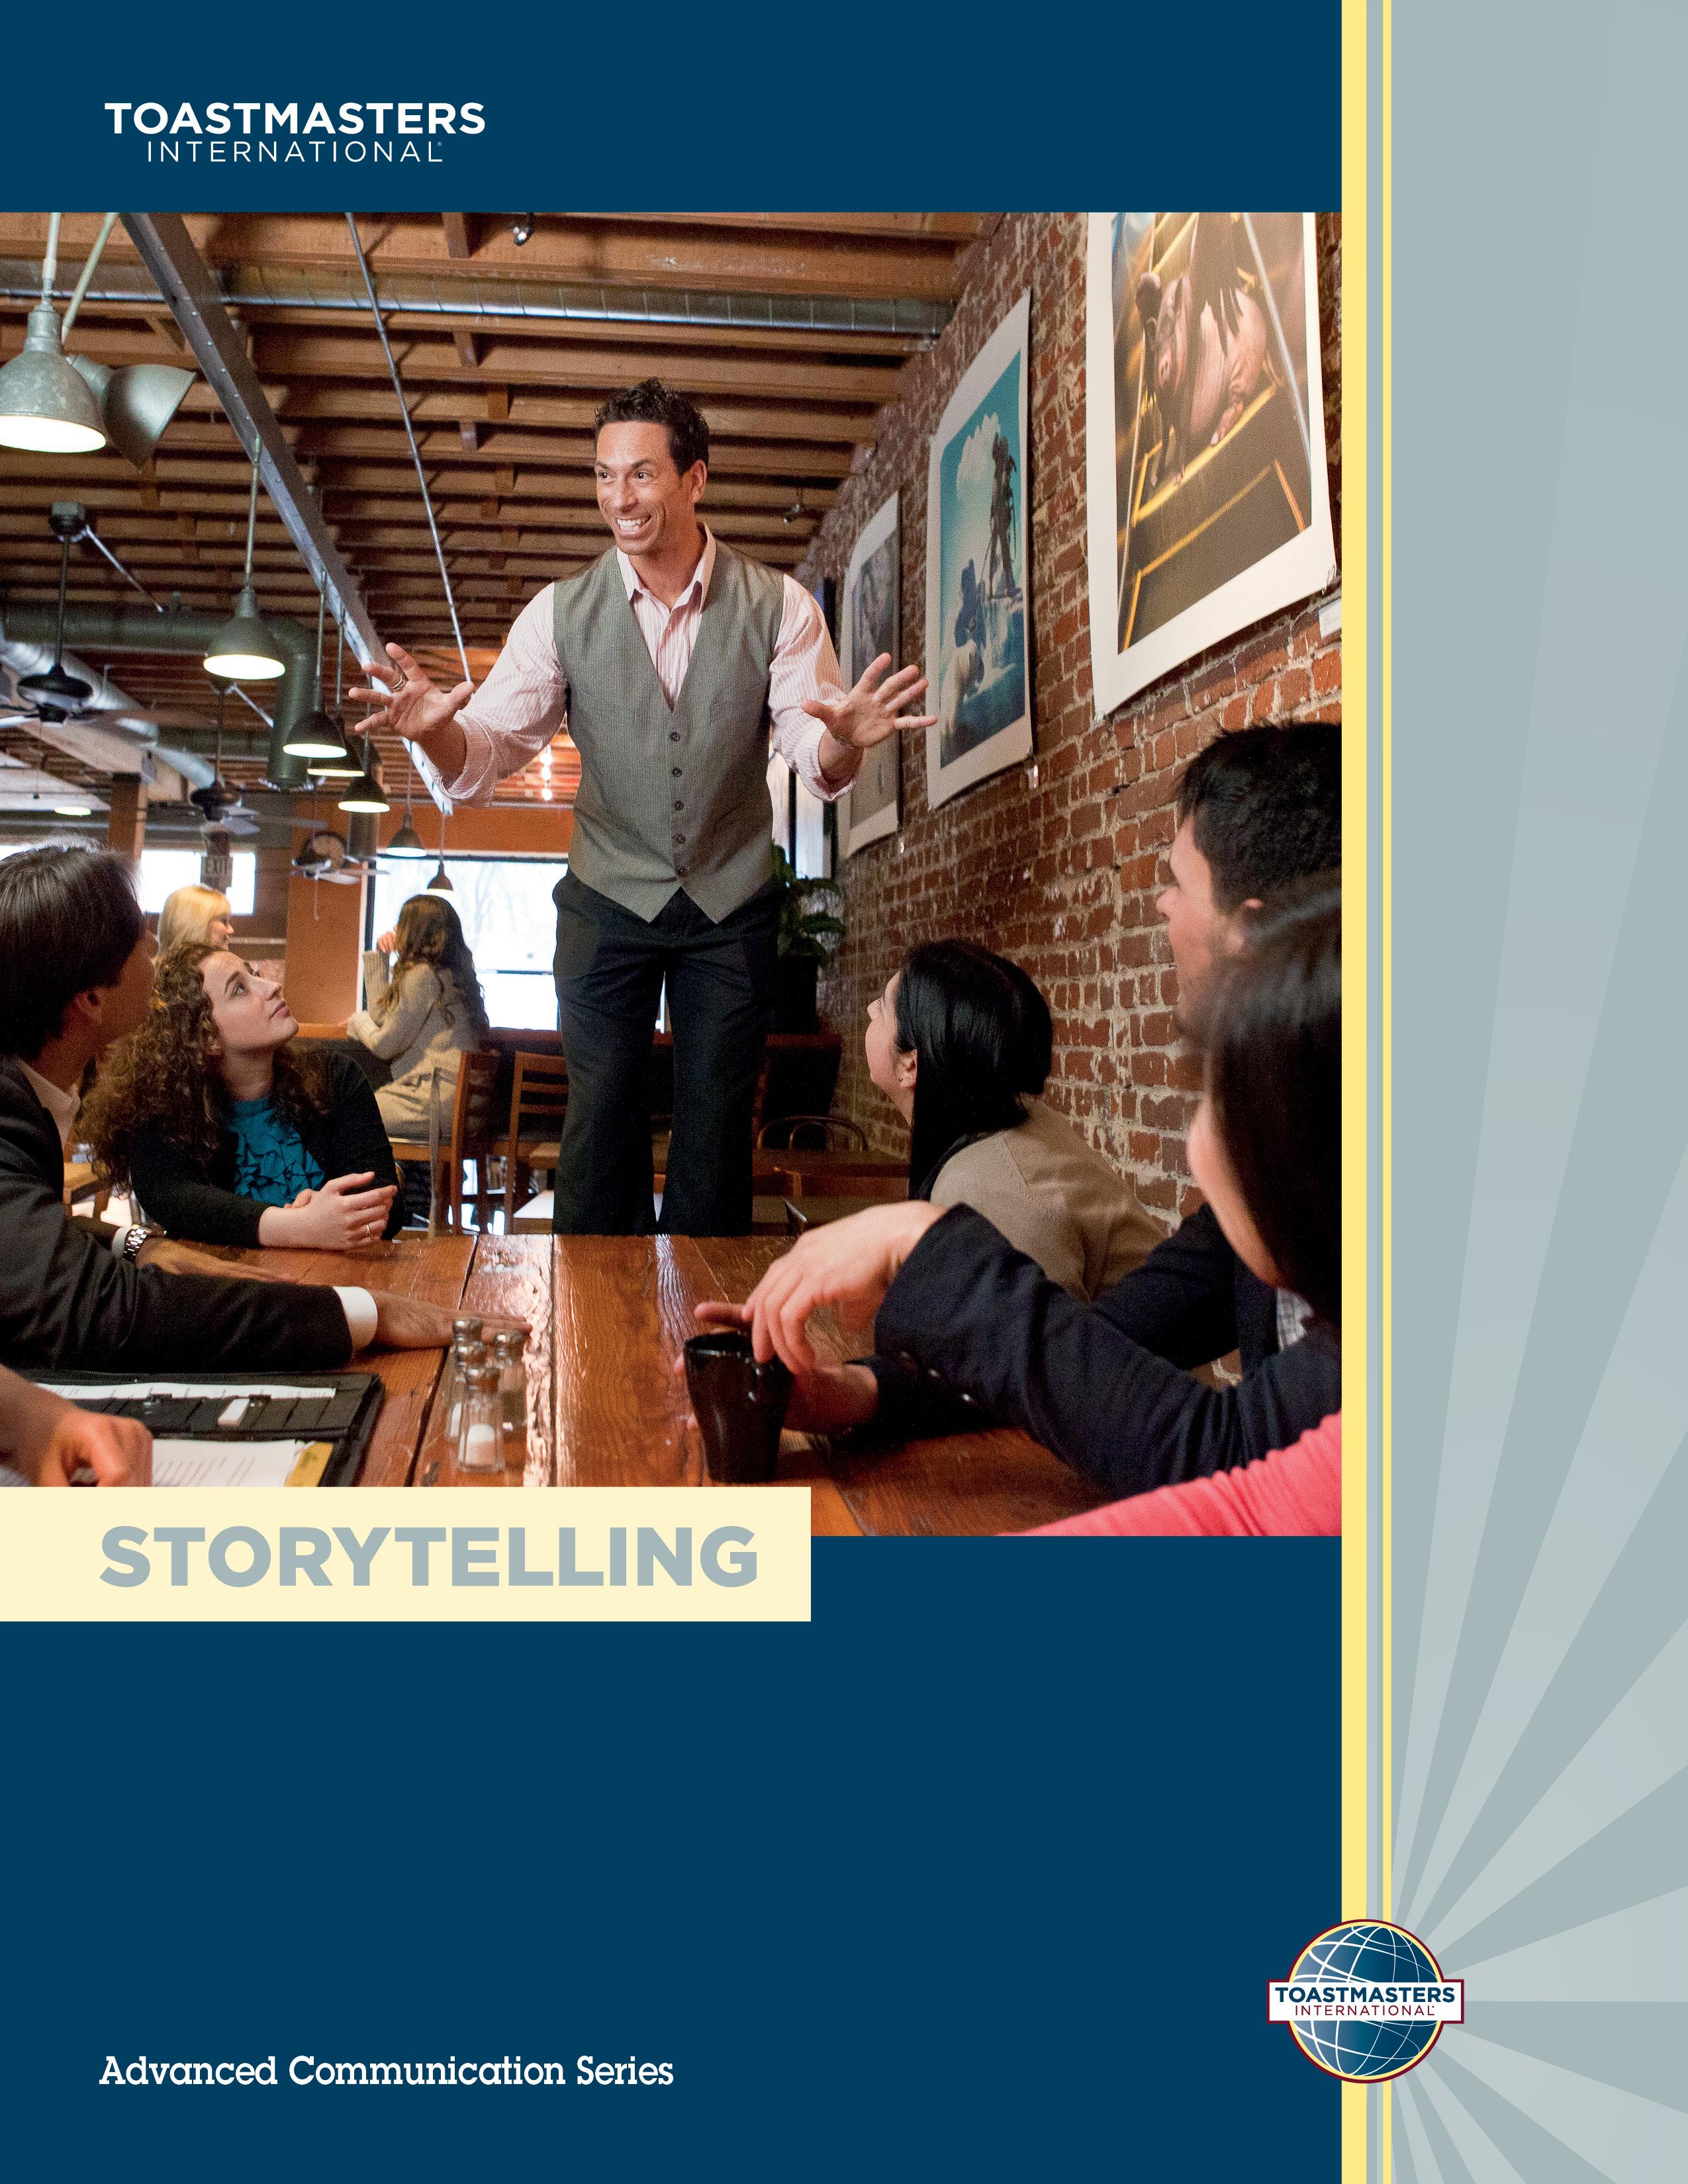 storytelling rh toastmasters org toastmasters storytelling manual project 2 toastmasters storytelling manual project 5